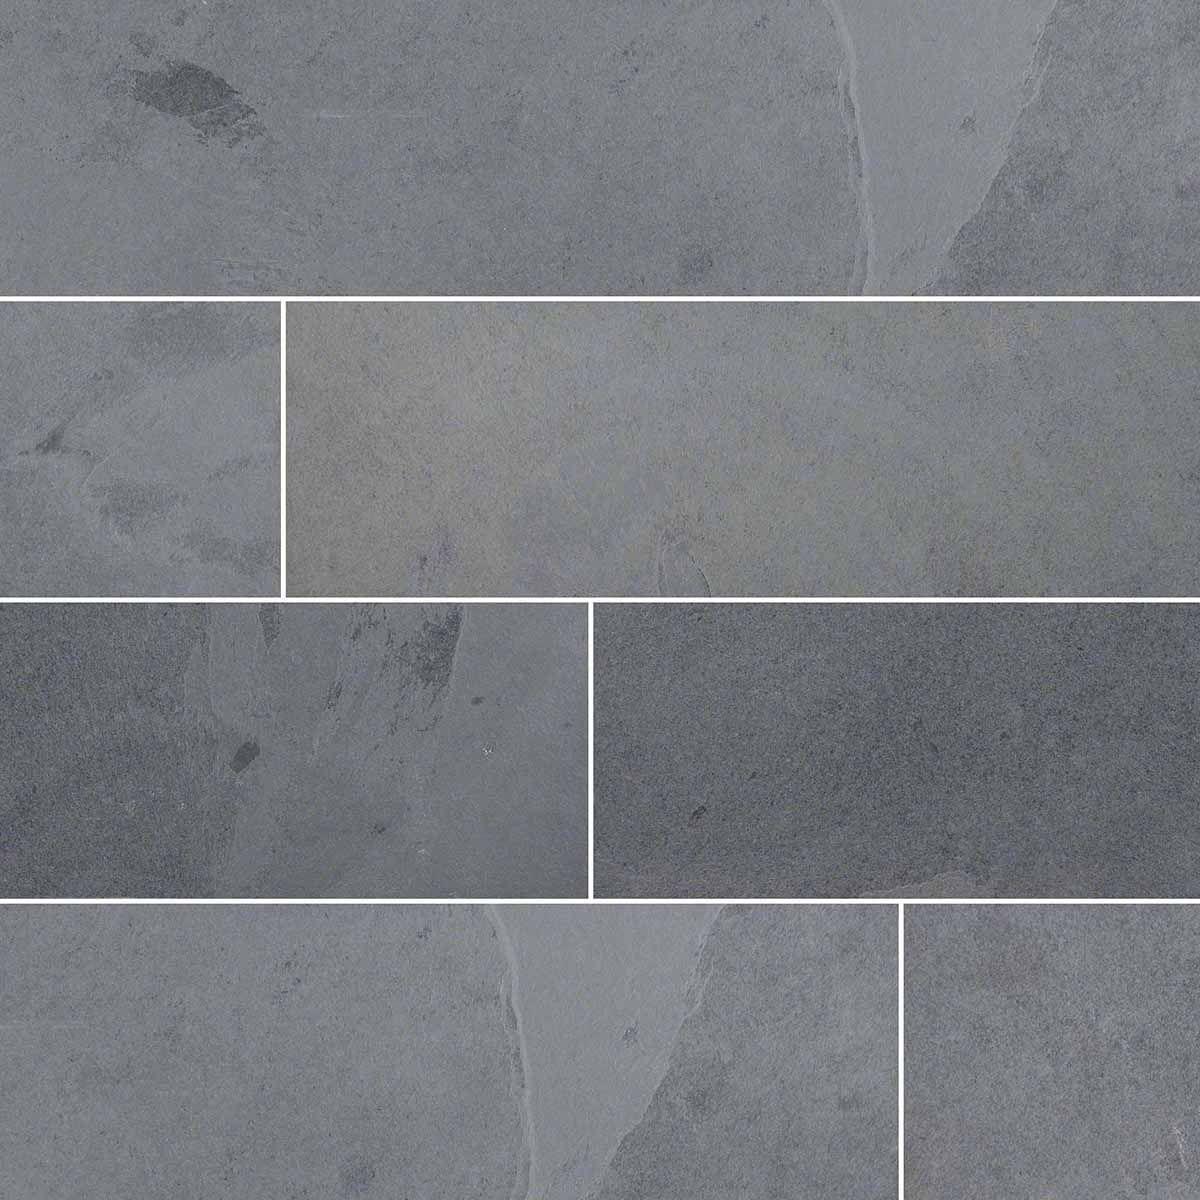 Kitchen room scene calacatta classique quartz countertop montauk black slate comes in gauged dailygadgetfo Choice Image